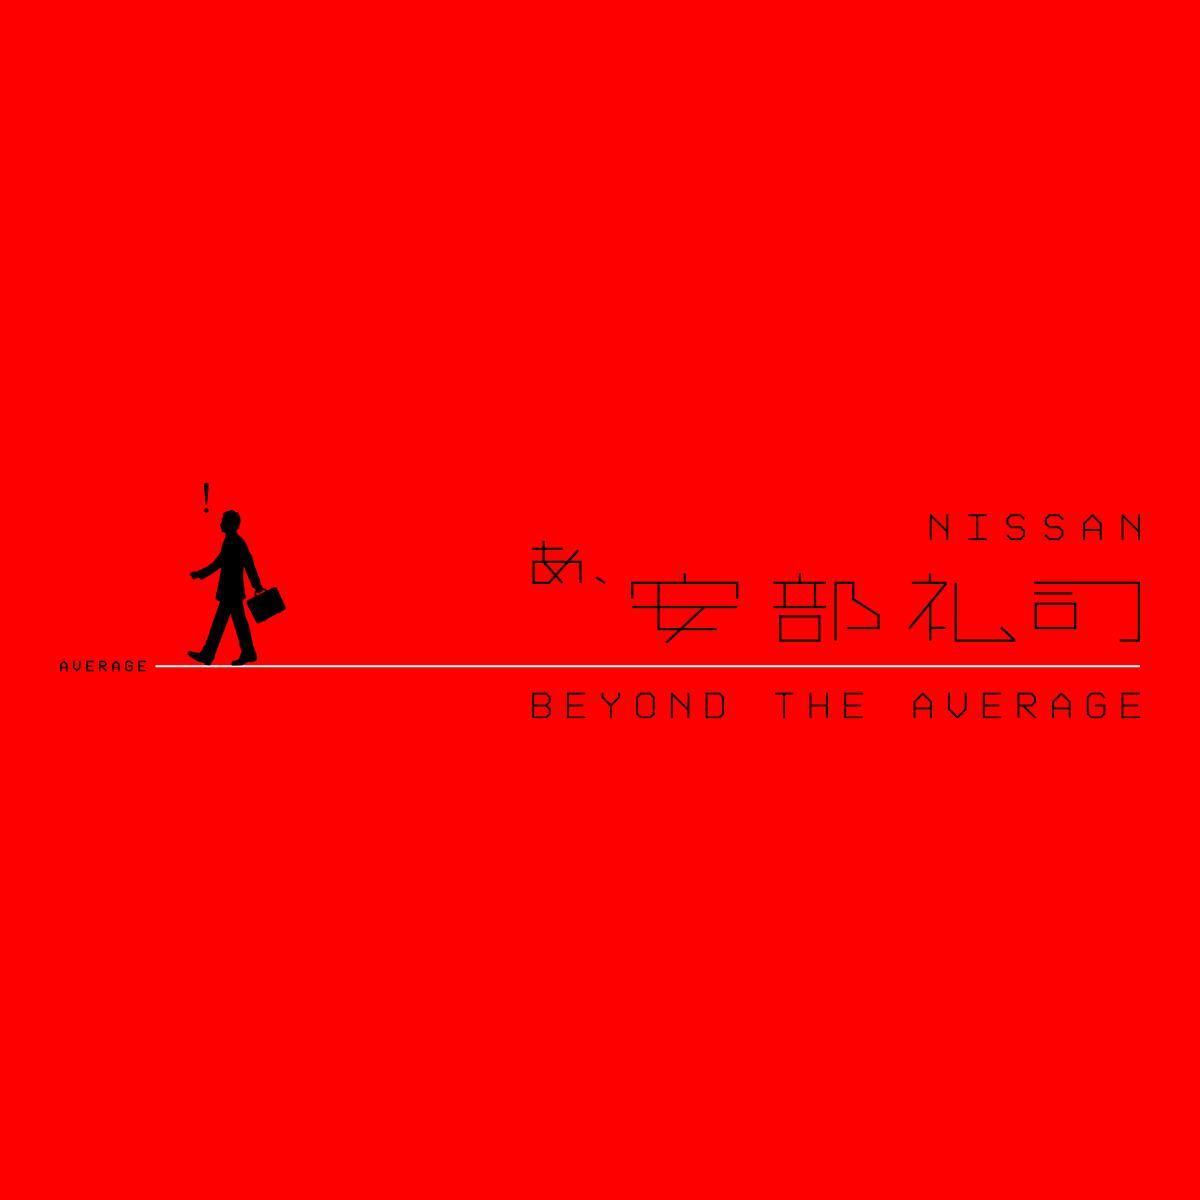 Nissan あ 安部礼司 Beyond The Average